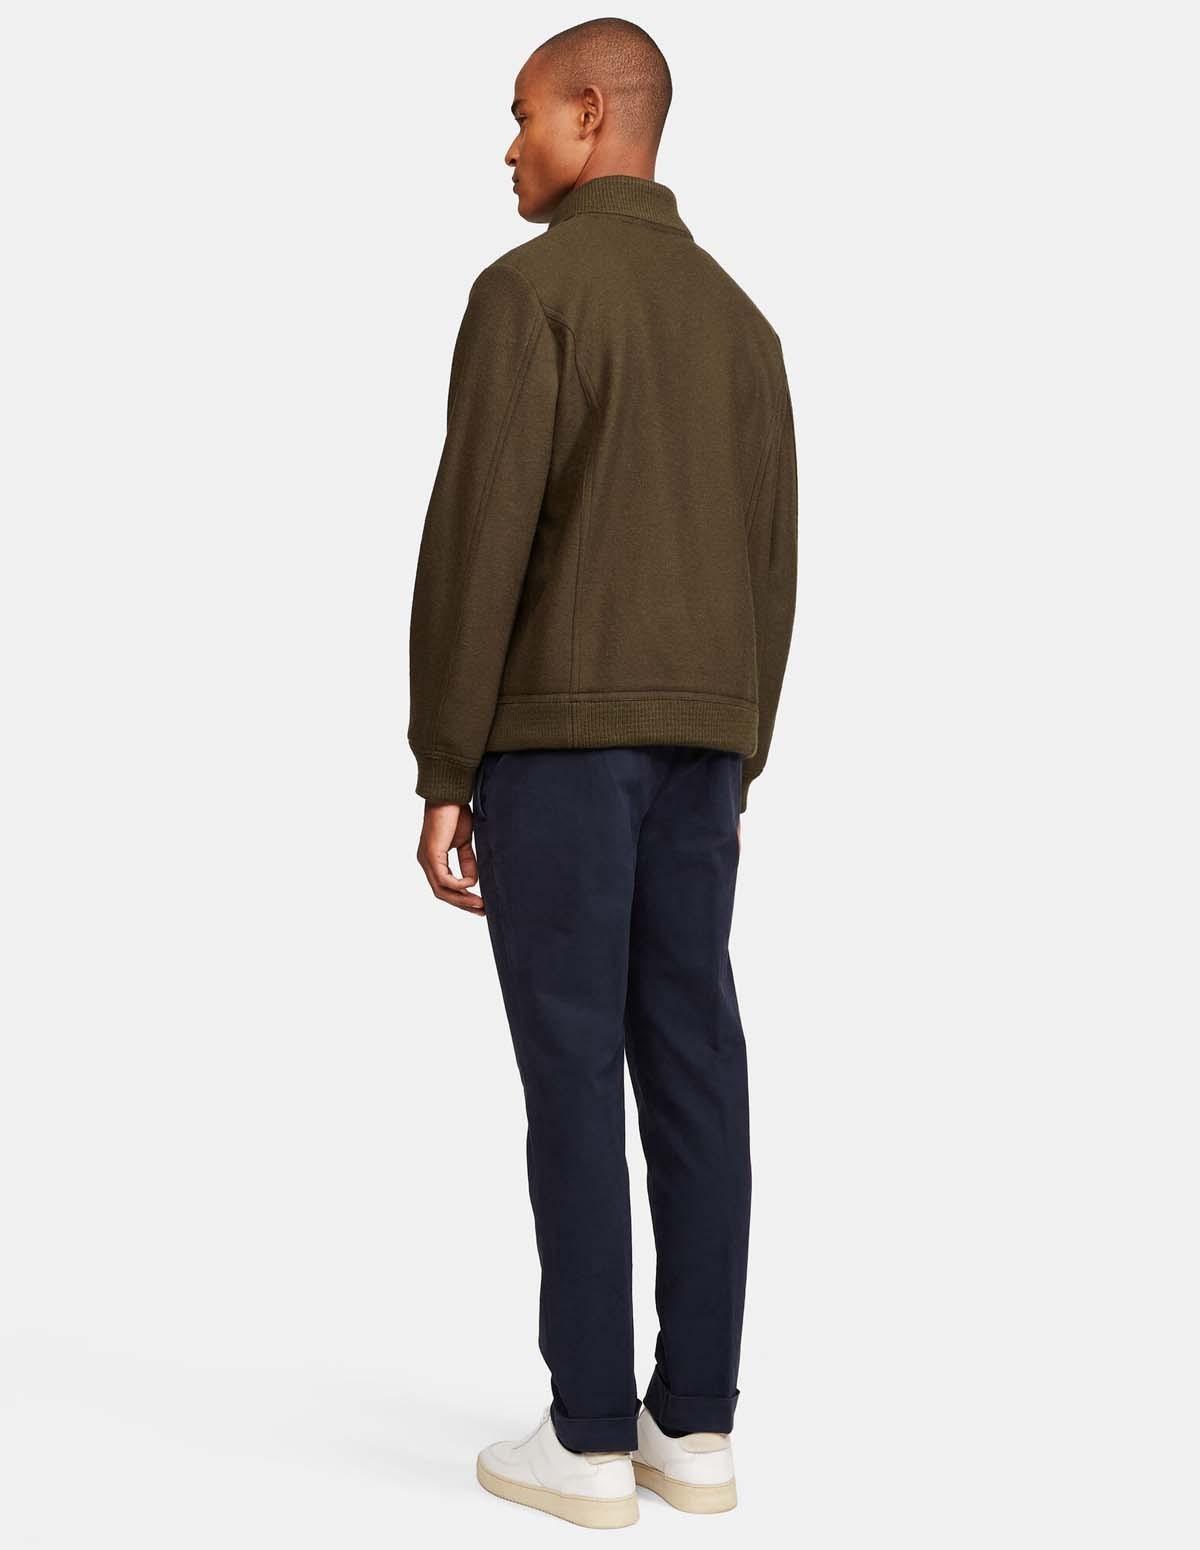 Aspesi New Astor Jacket